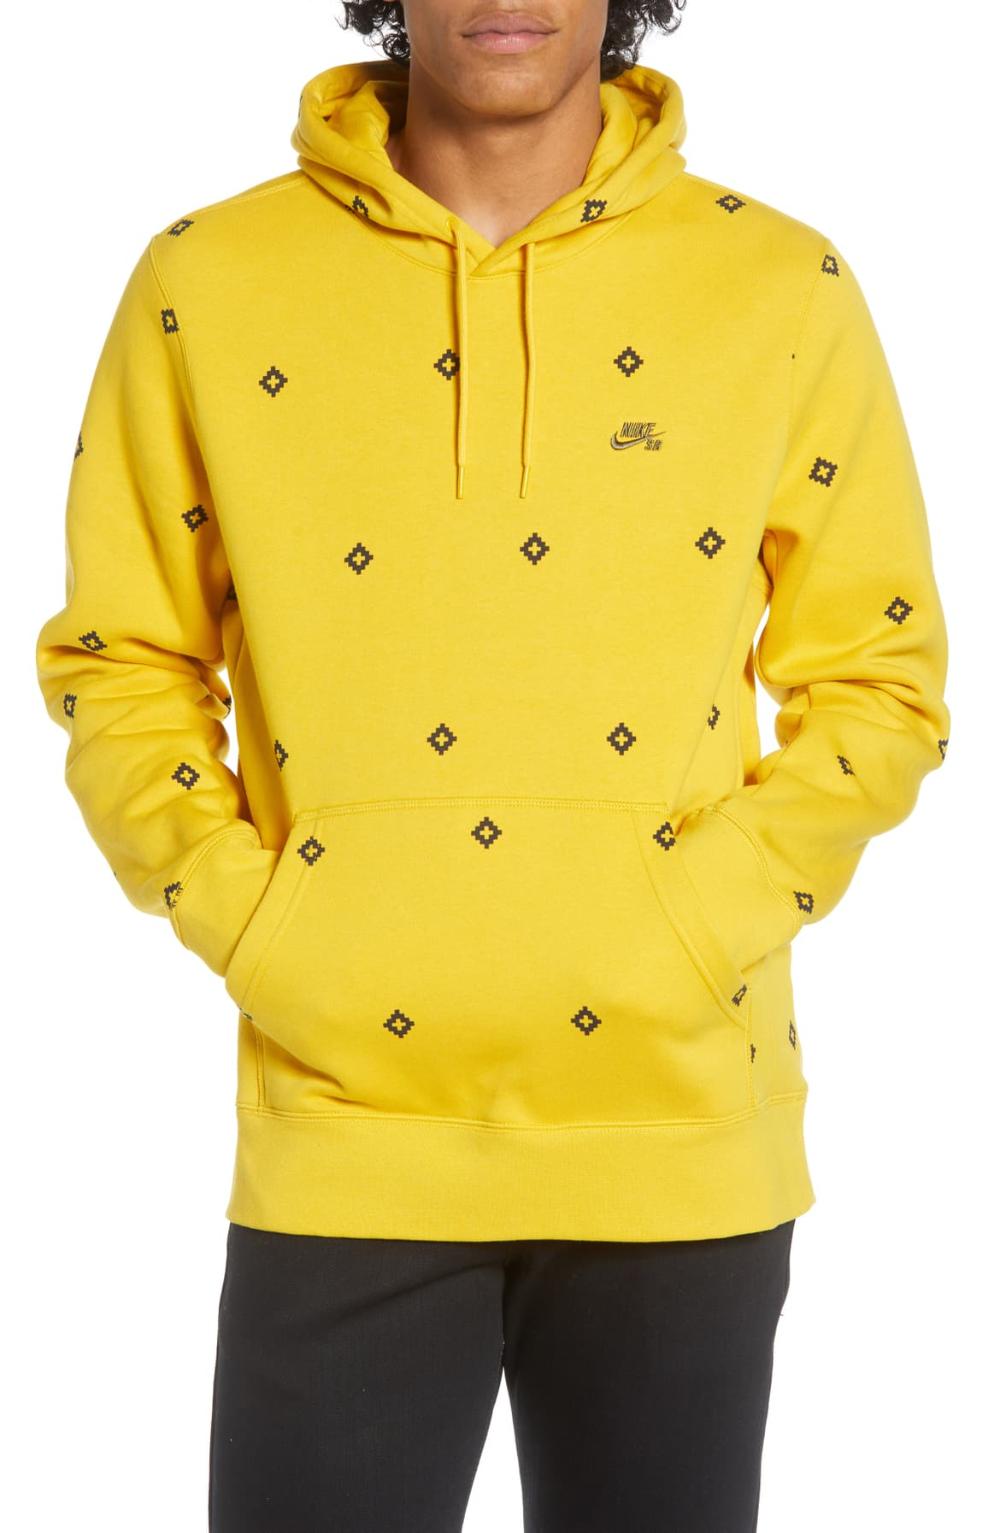 Nike Sb Icon Hooded Sweatshirt Nordstrom Hooded Sweatshirts Sweatshirts Sweatshirt Fashion [ 1533 x 1000 Pixel ]